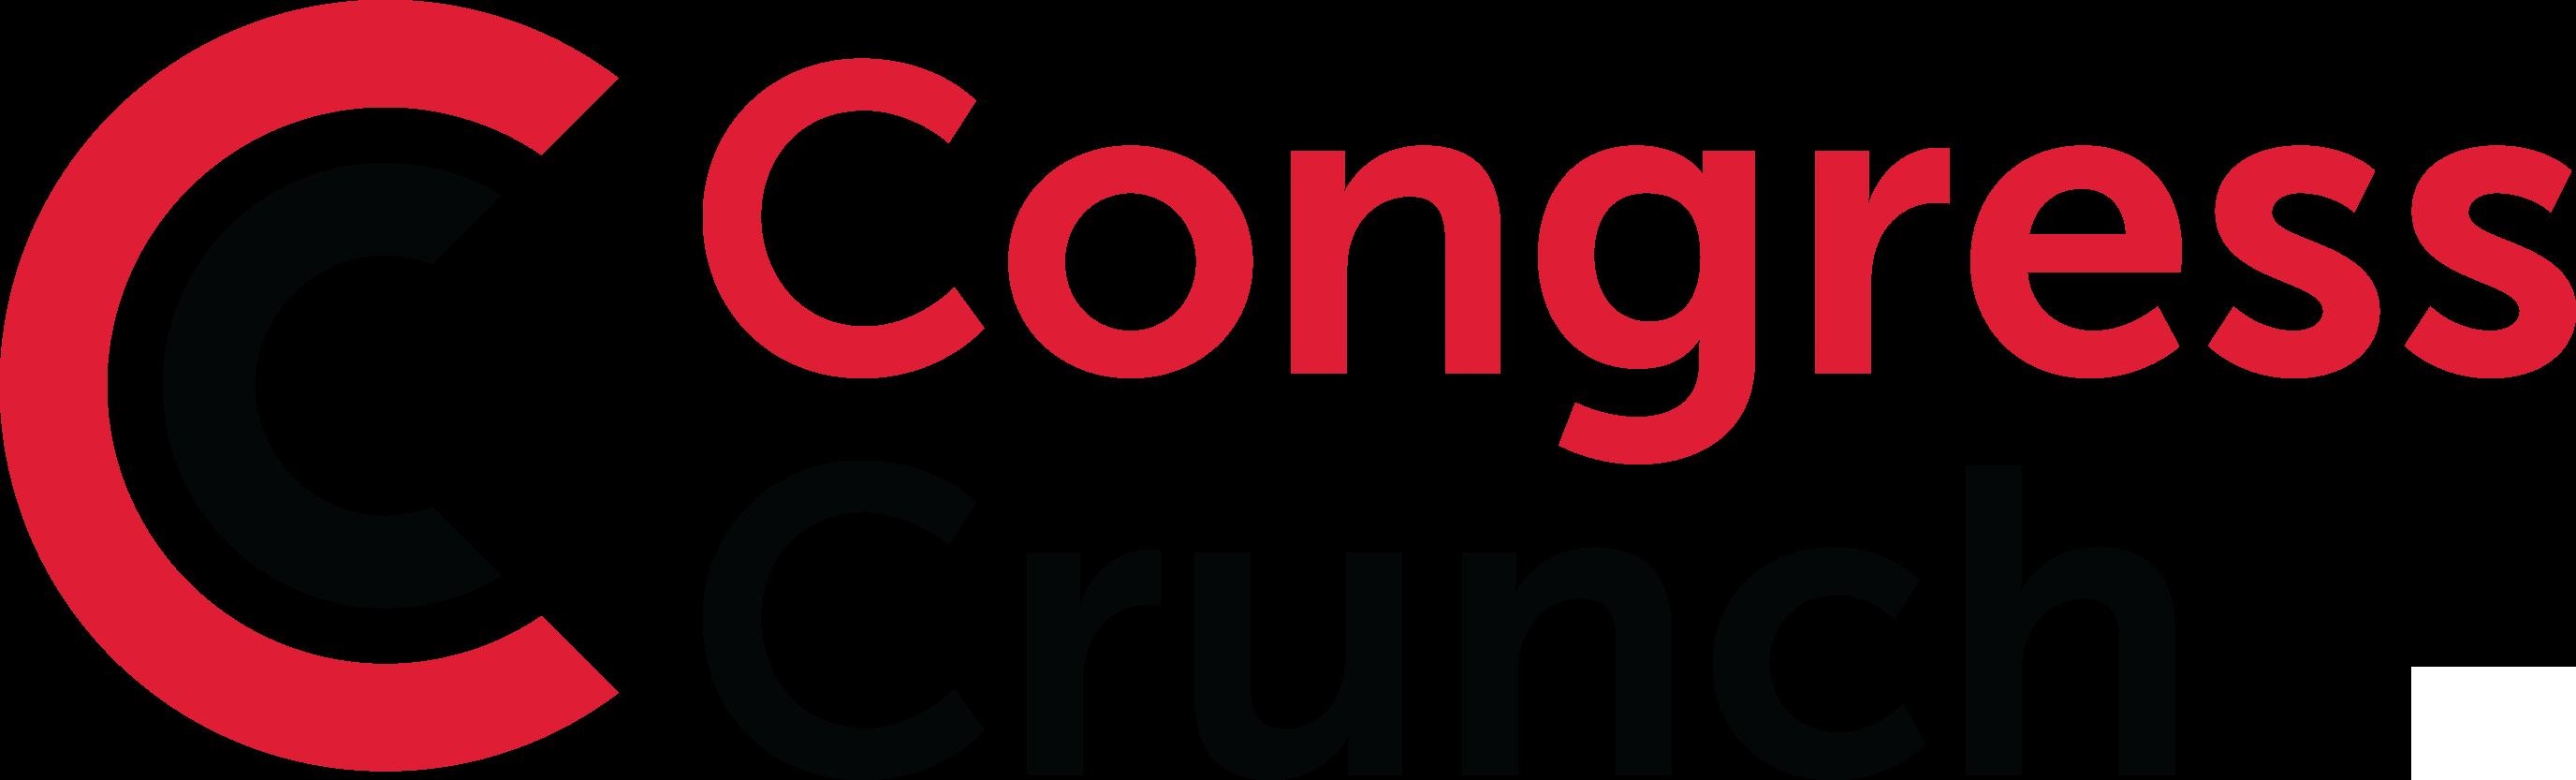 Congress Crunch_RGB.png